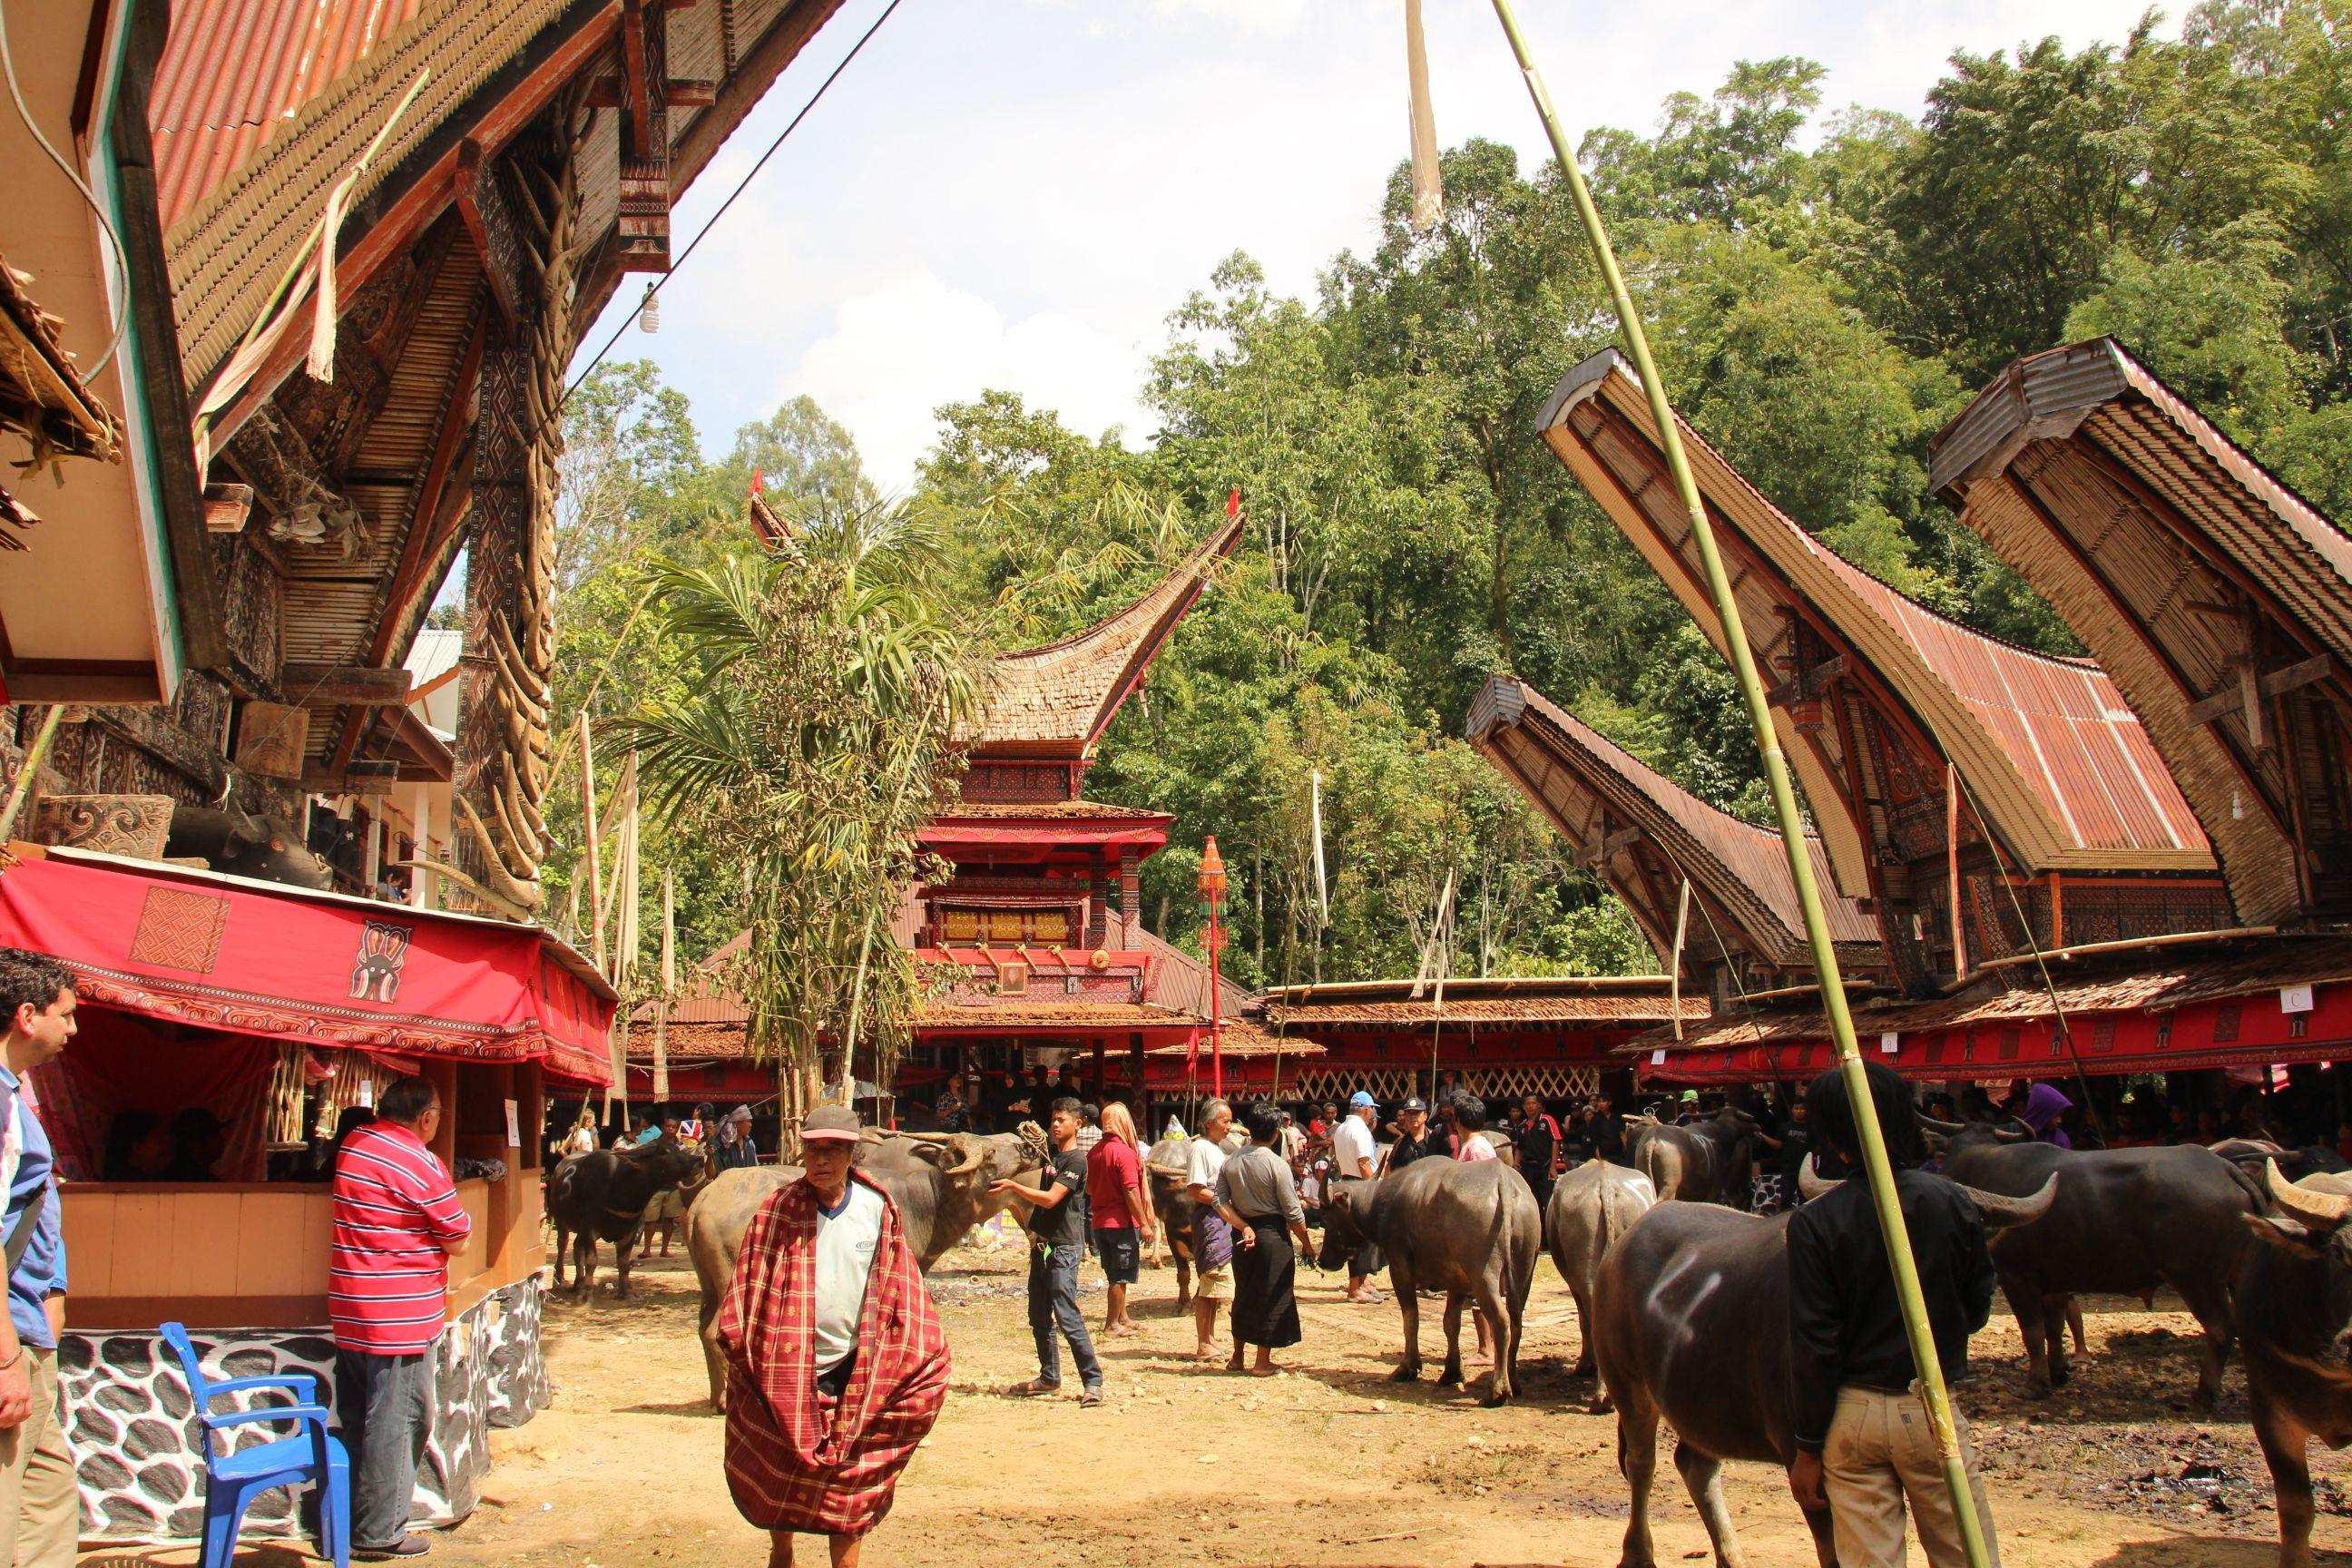 Indonesie Sulawesi Tana Toraja